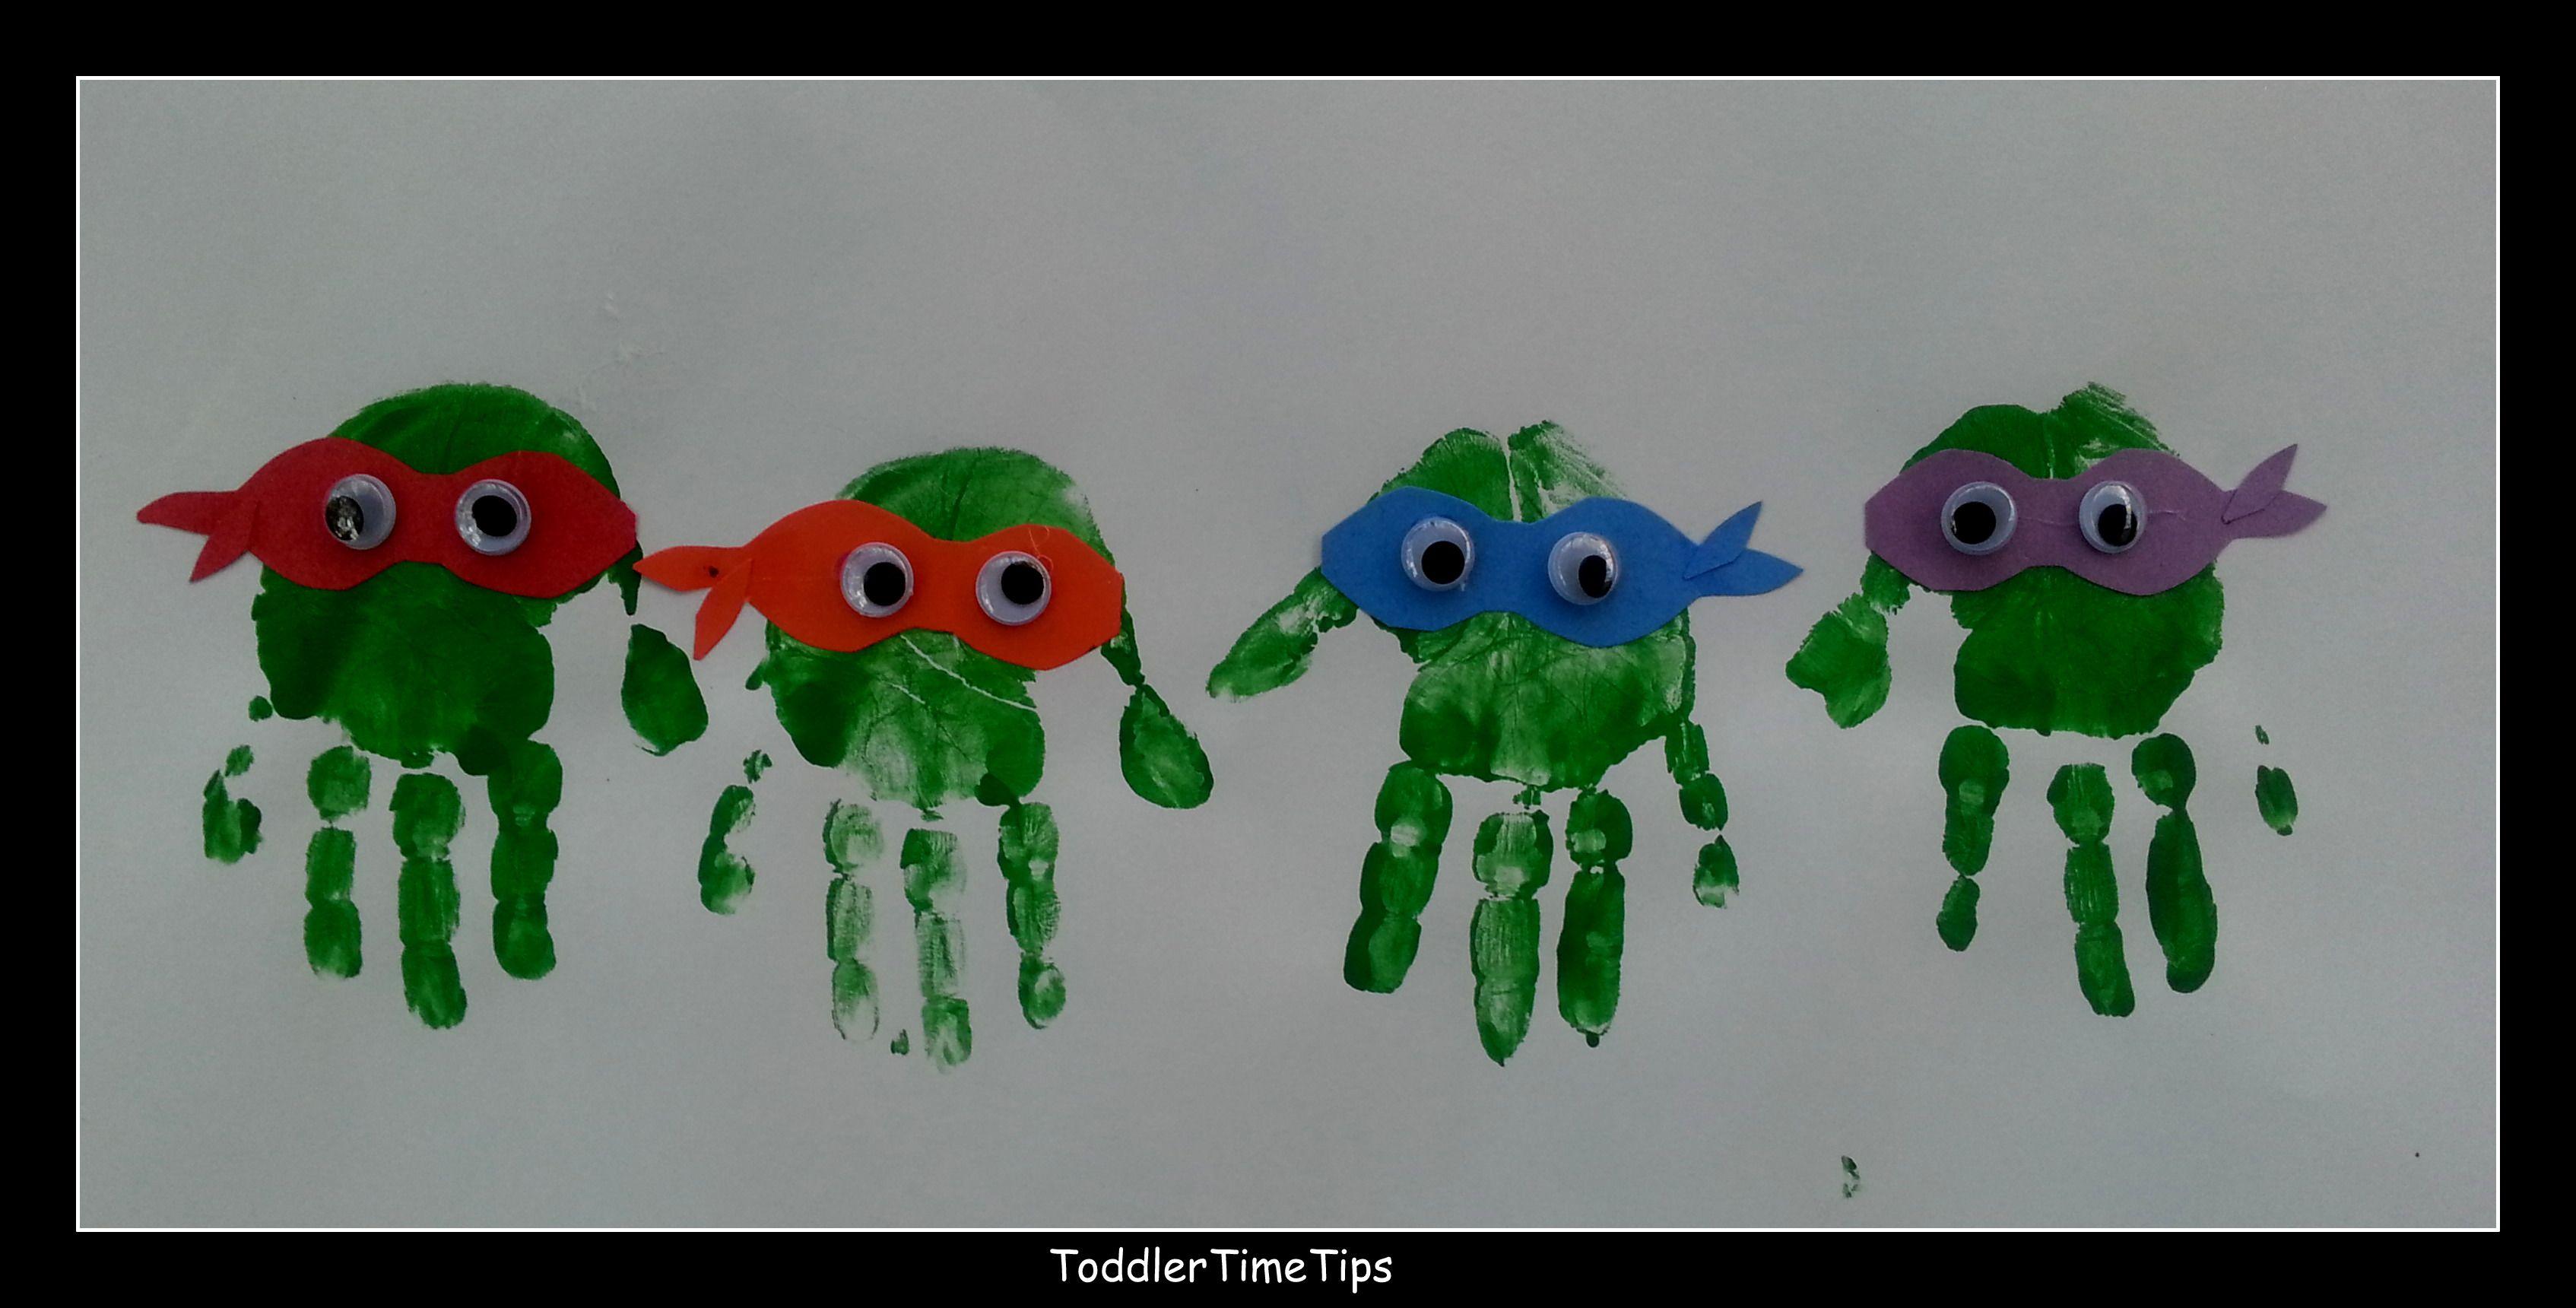 Pin by margo smith on camps pinterest ninja turtles ninja